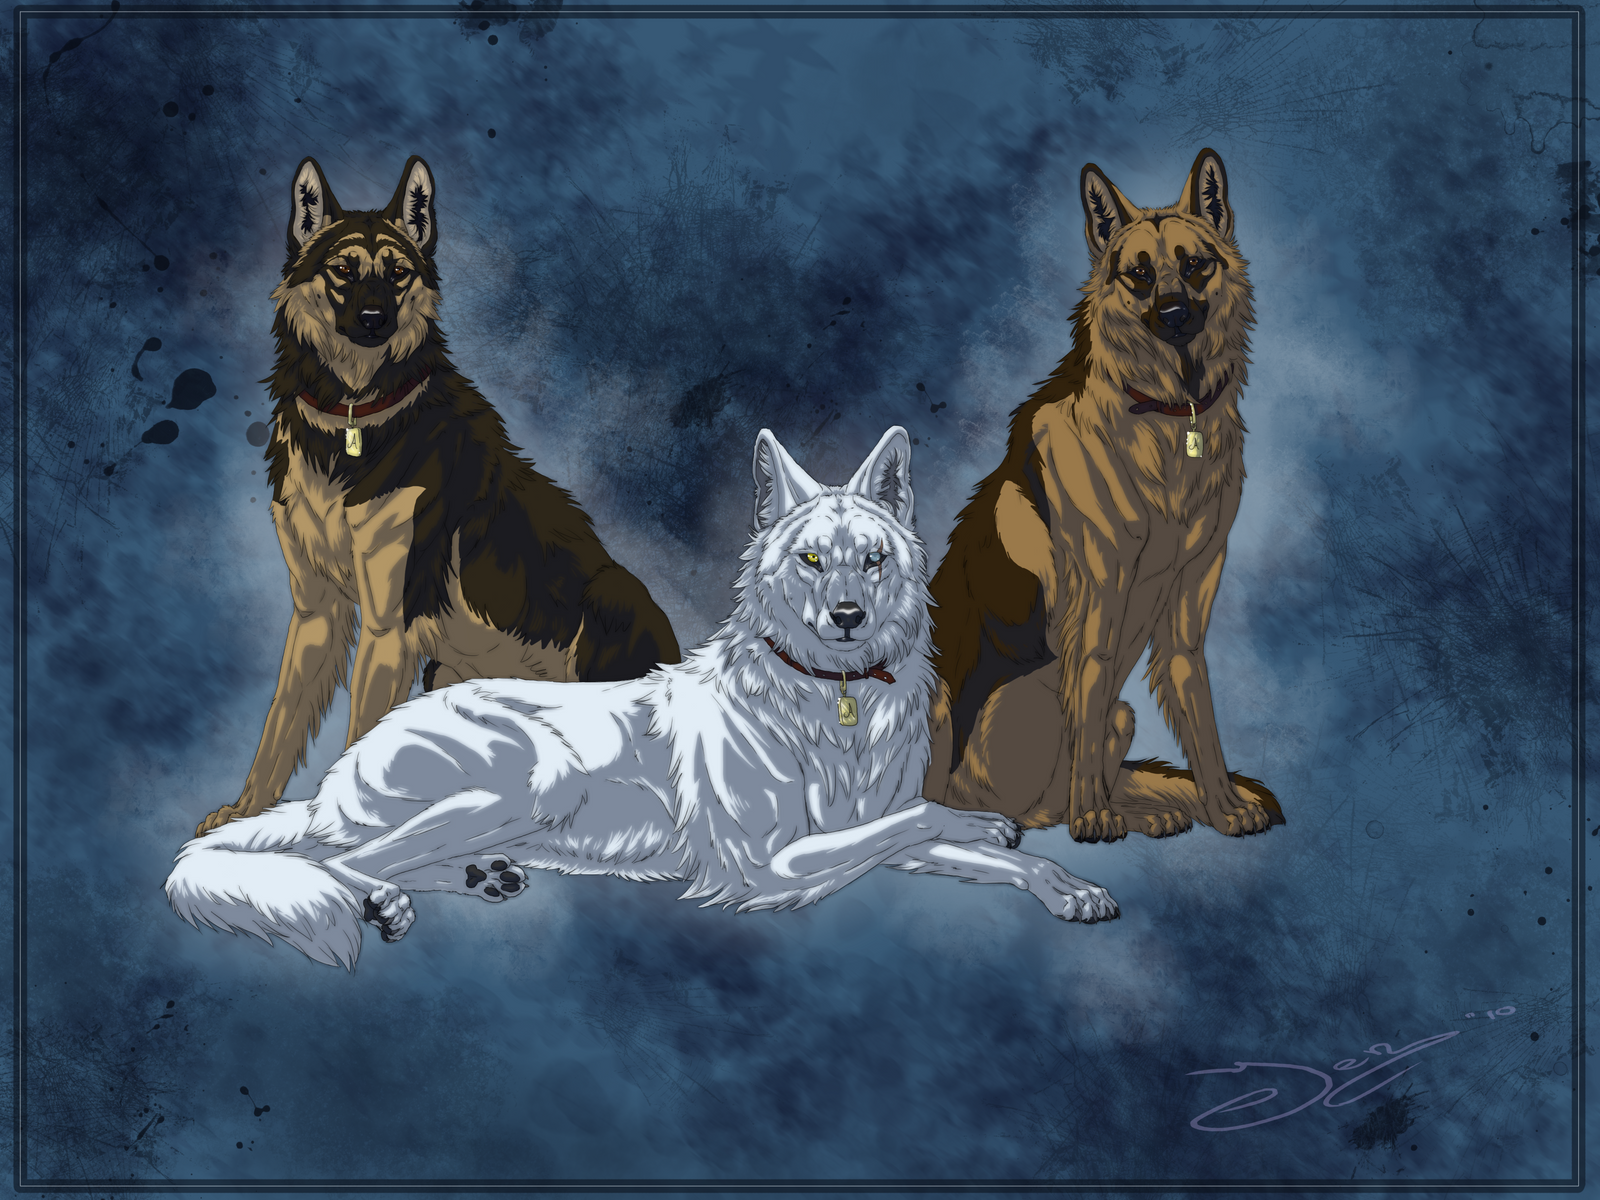 the 3 guardians by mangakasan